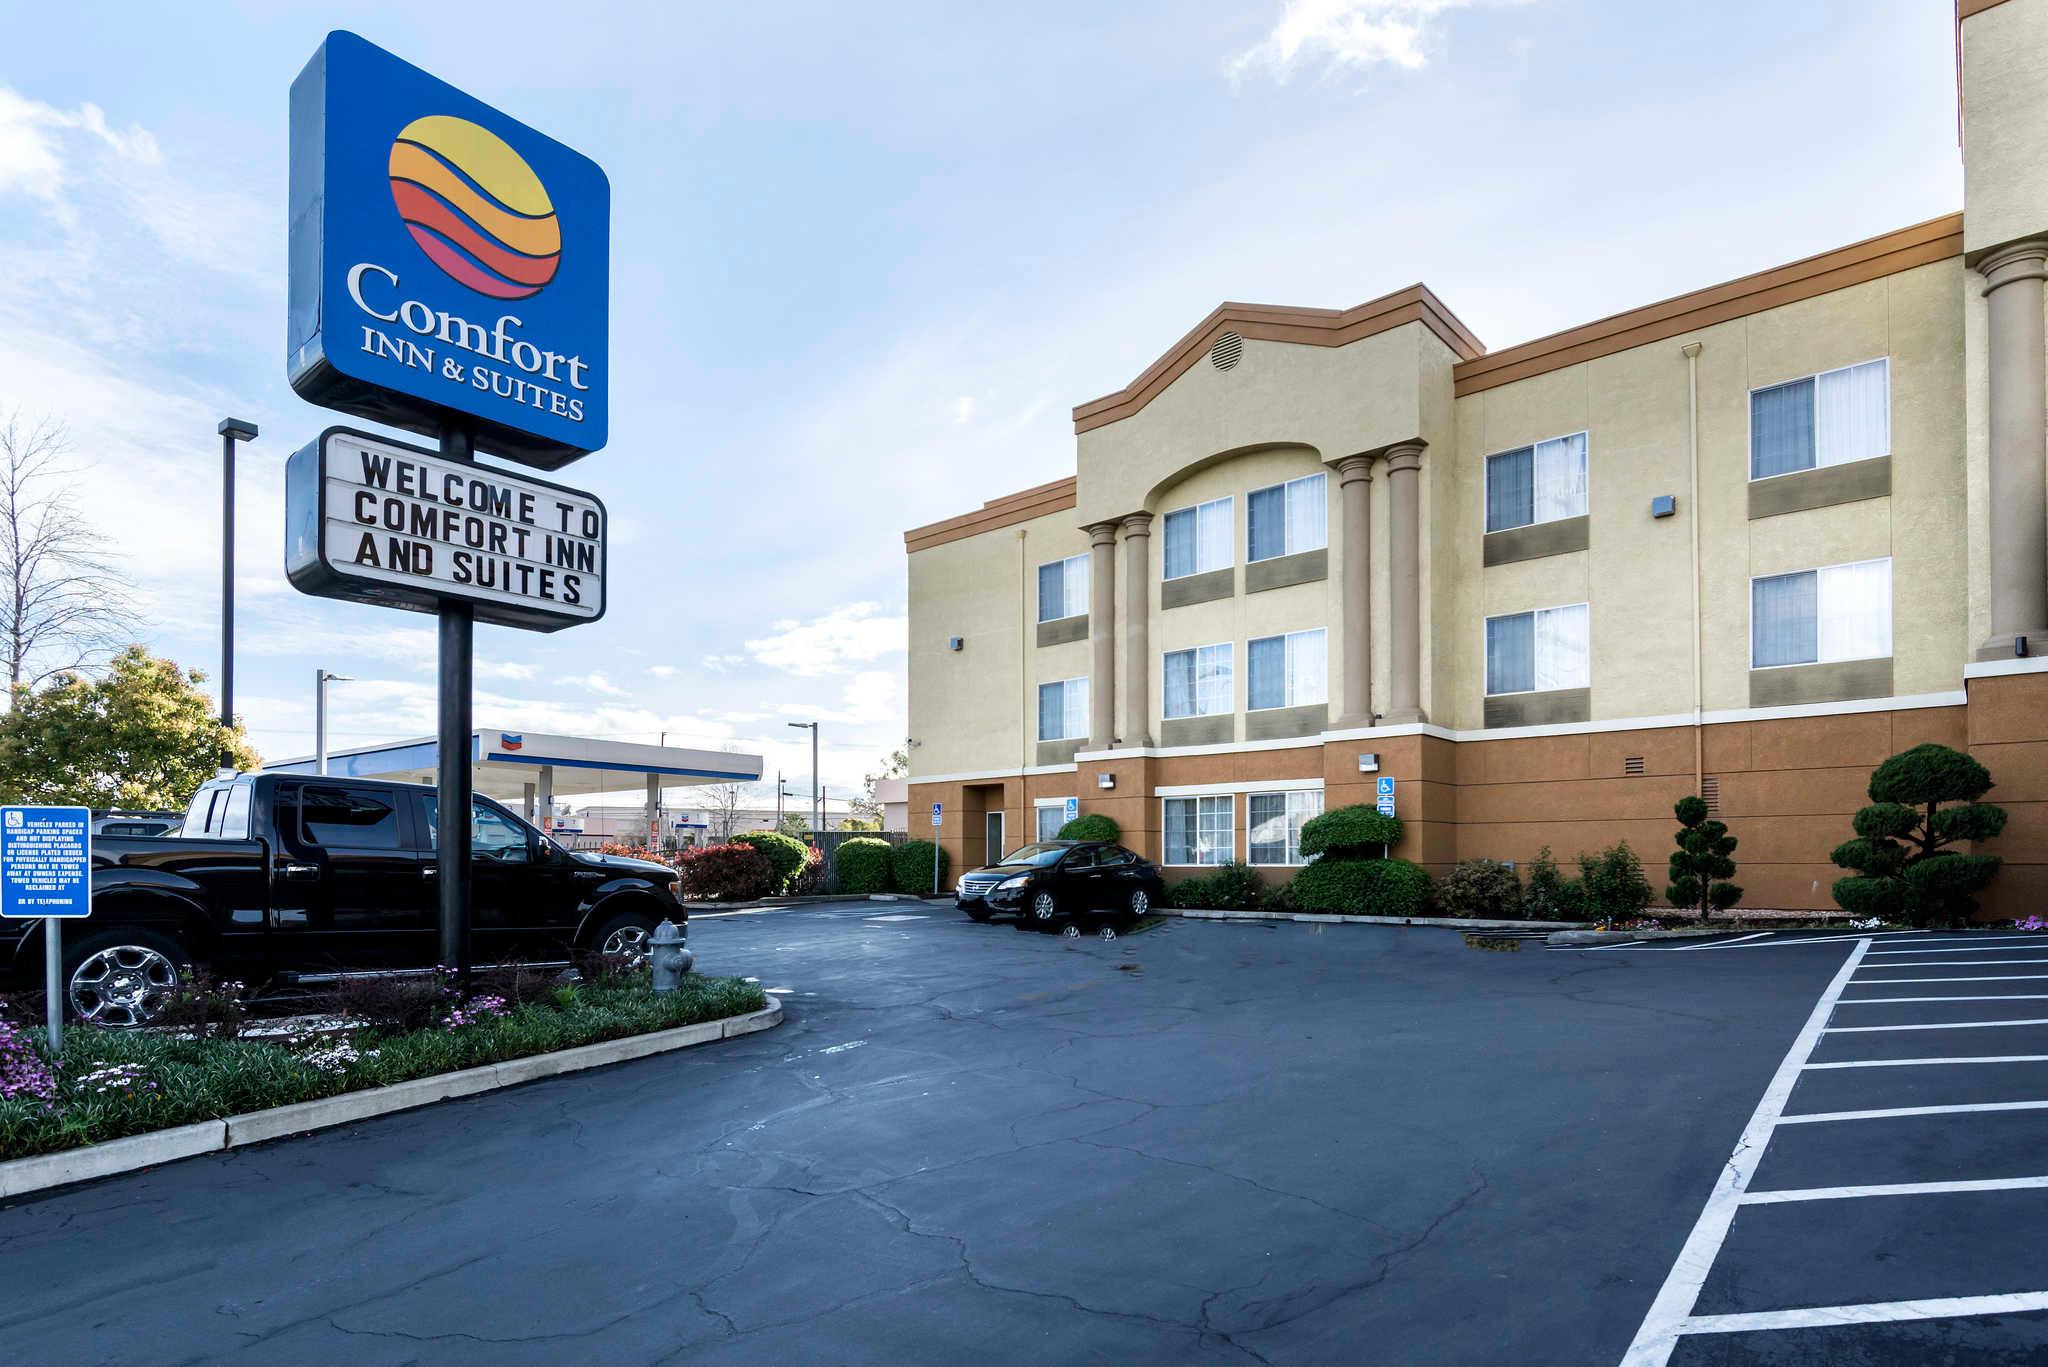 Comfort Inn & Suites Sacramento - University Area image 1